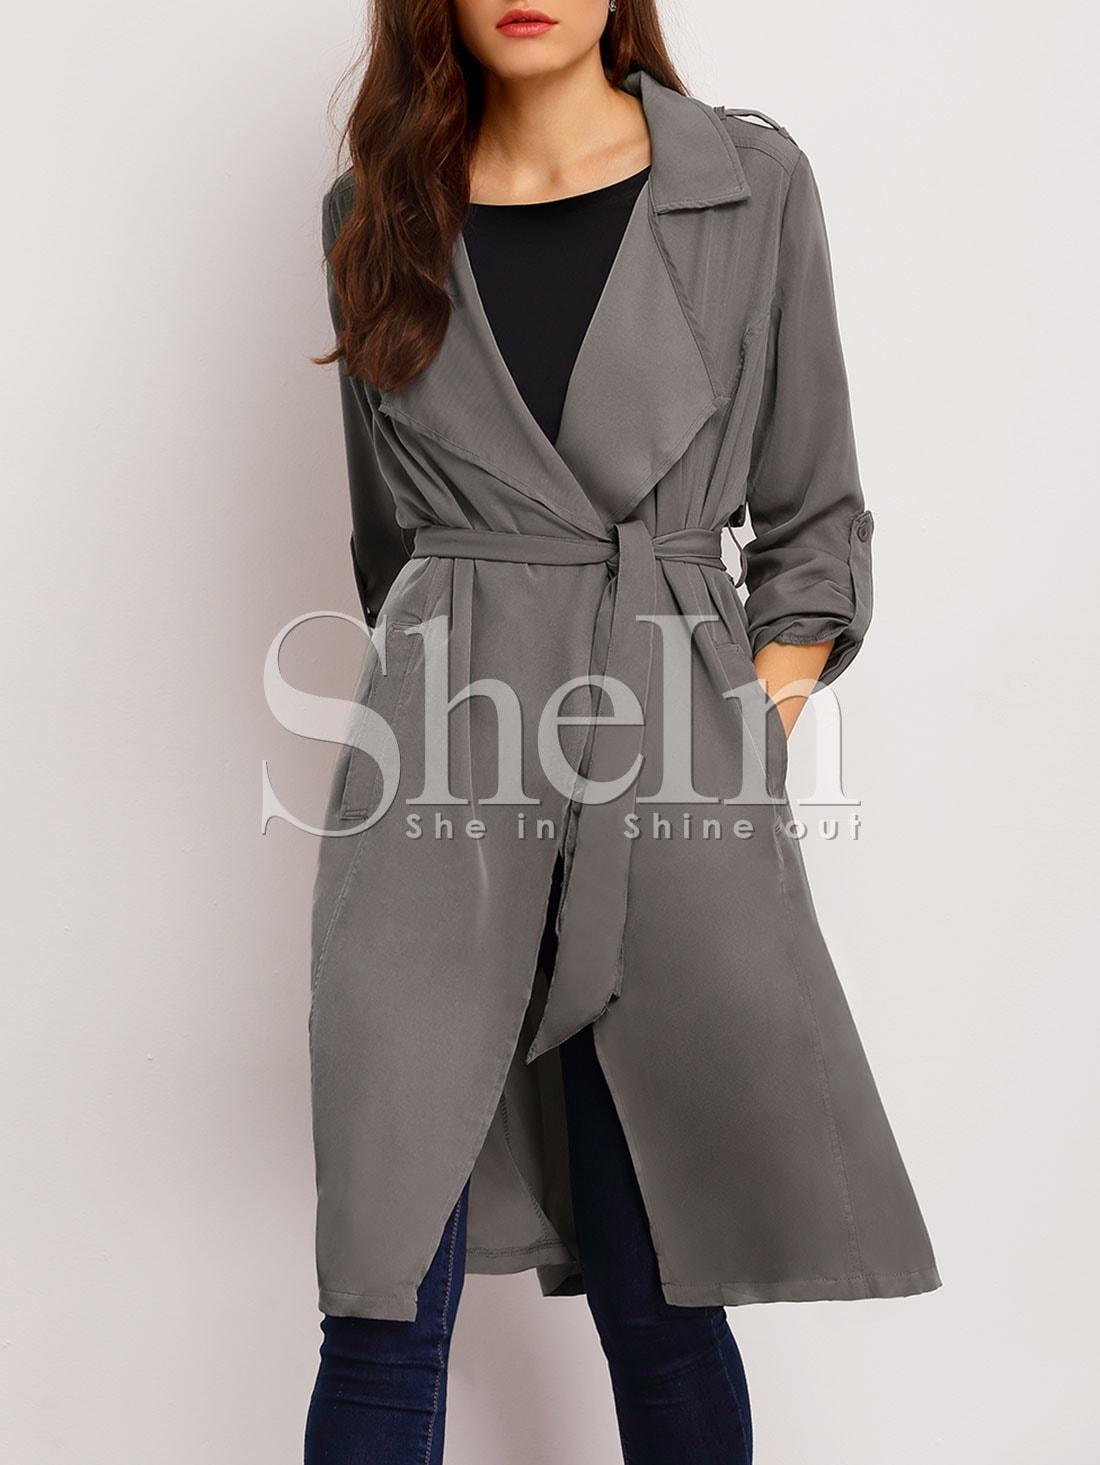 Grey Long Sleeve Lapel Pockets Trench CoatGrey Long Sleeve Lapel Pockets Trench Coat<br><br>color: Grey<br>size: L,M,S,XS